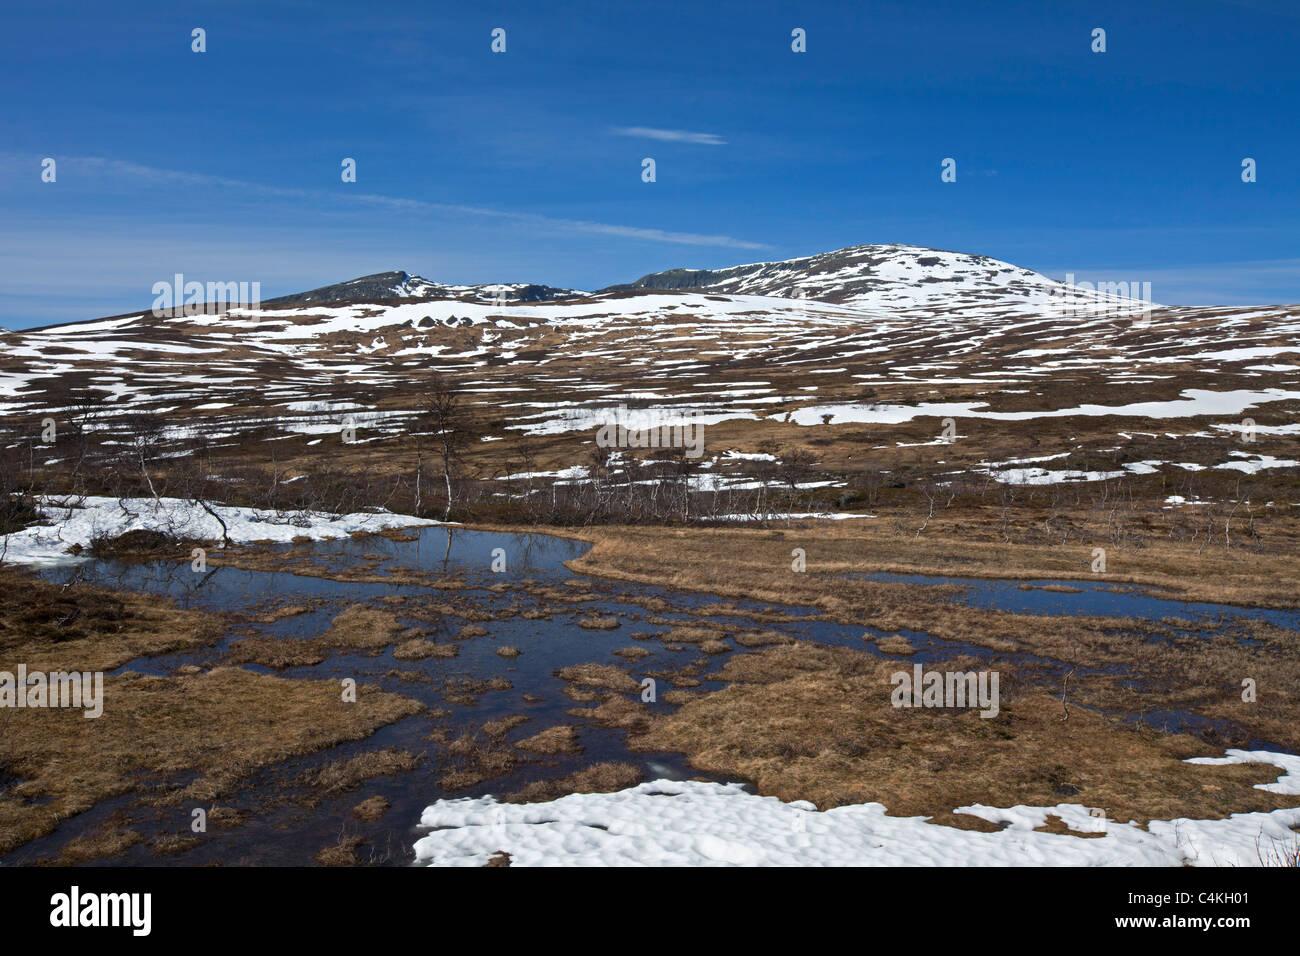 The tundra in the spring at Borgafjäll / Borgafjaell in Jämtland, northern Sweden - Stock Image